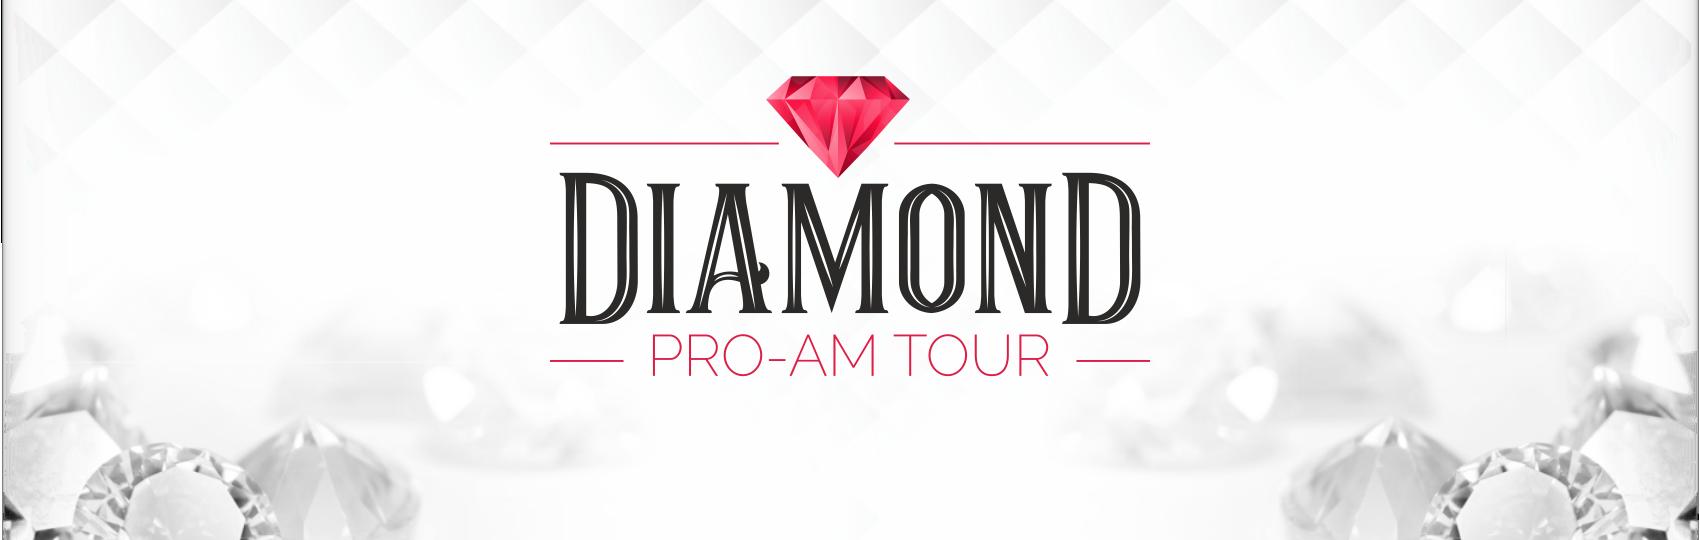 Diamond Pro-Am Tour